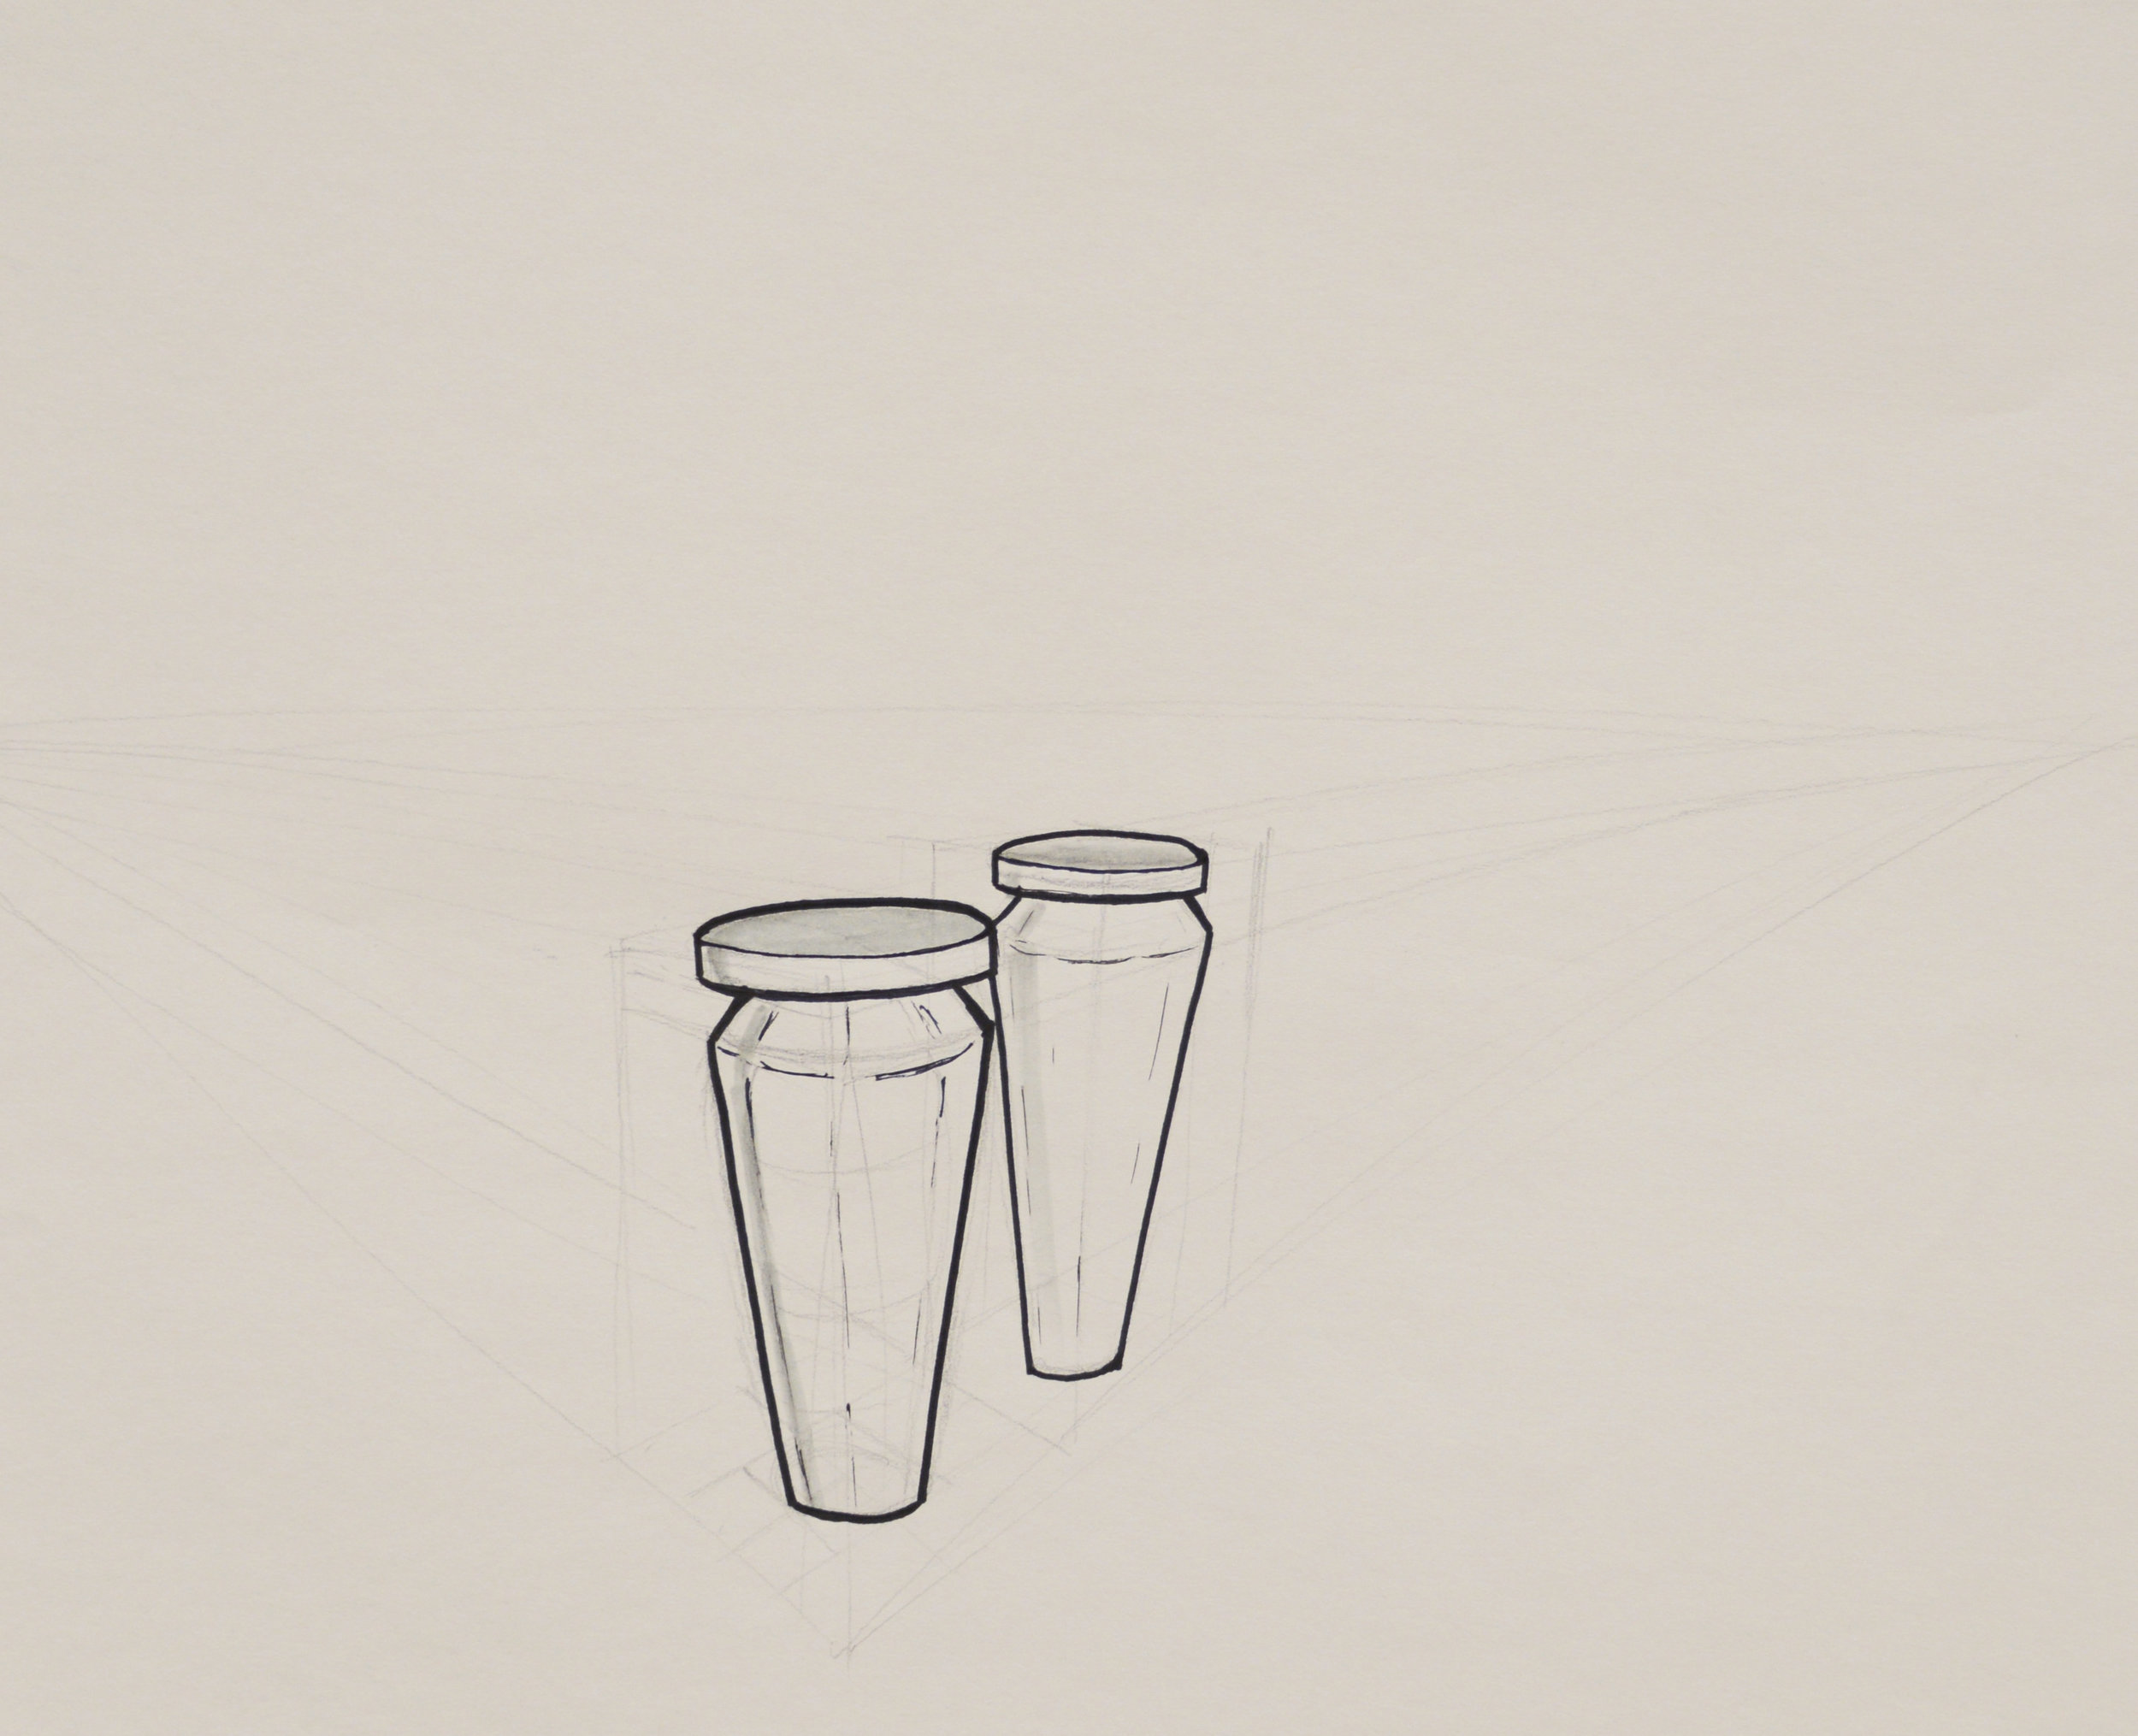 Lee, Megan Assignment 1 Luxury Sketch 7.jpg